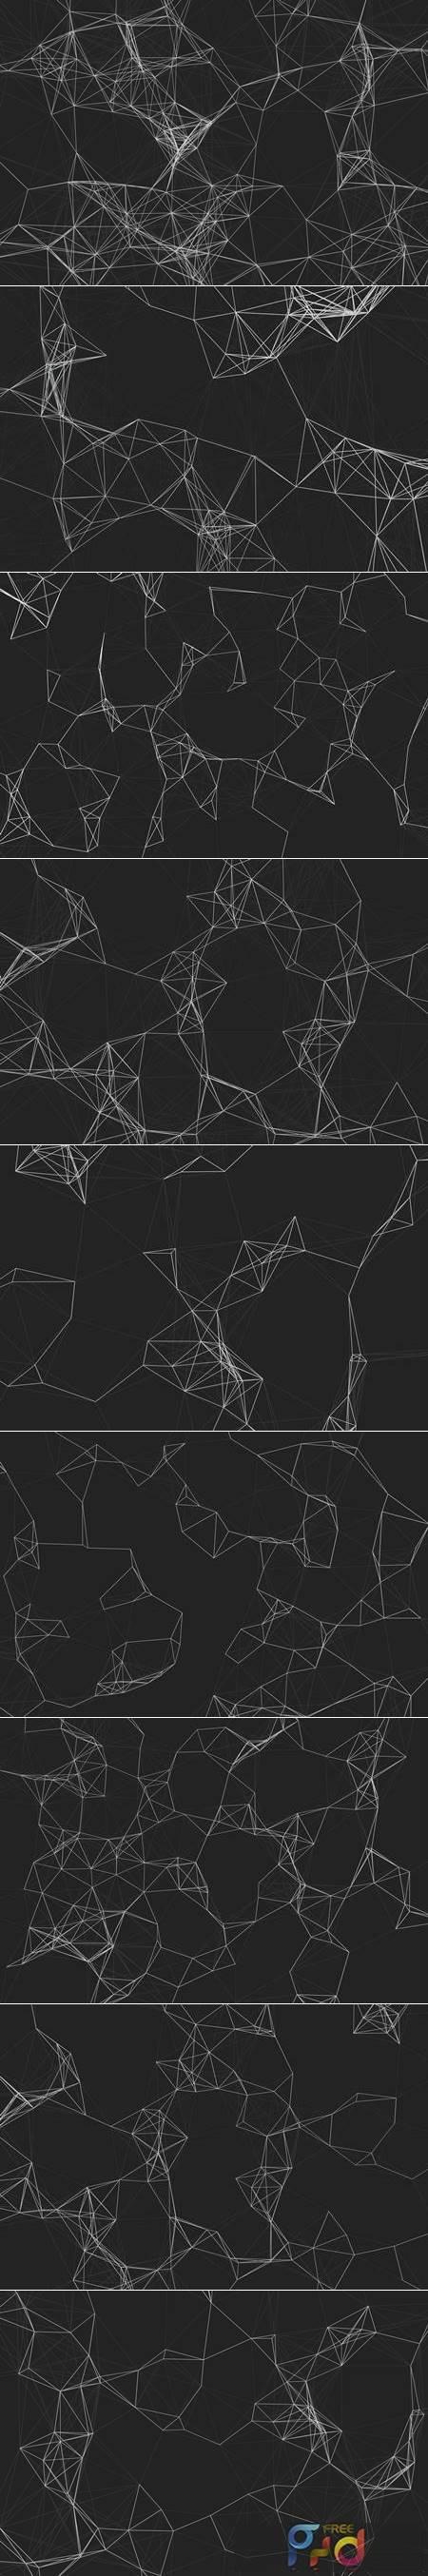 Polygon Mesh Background Set K92W3UC 1